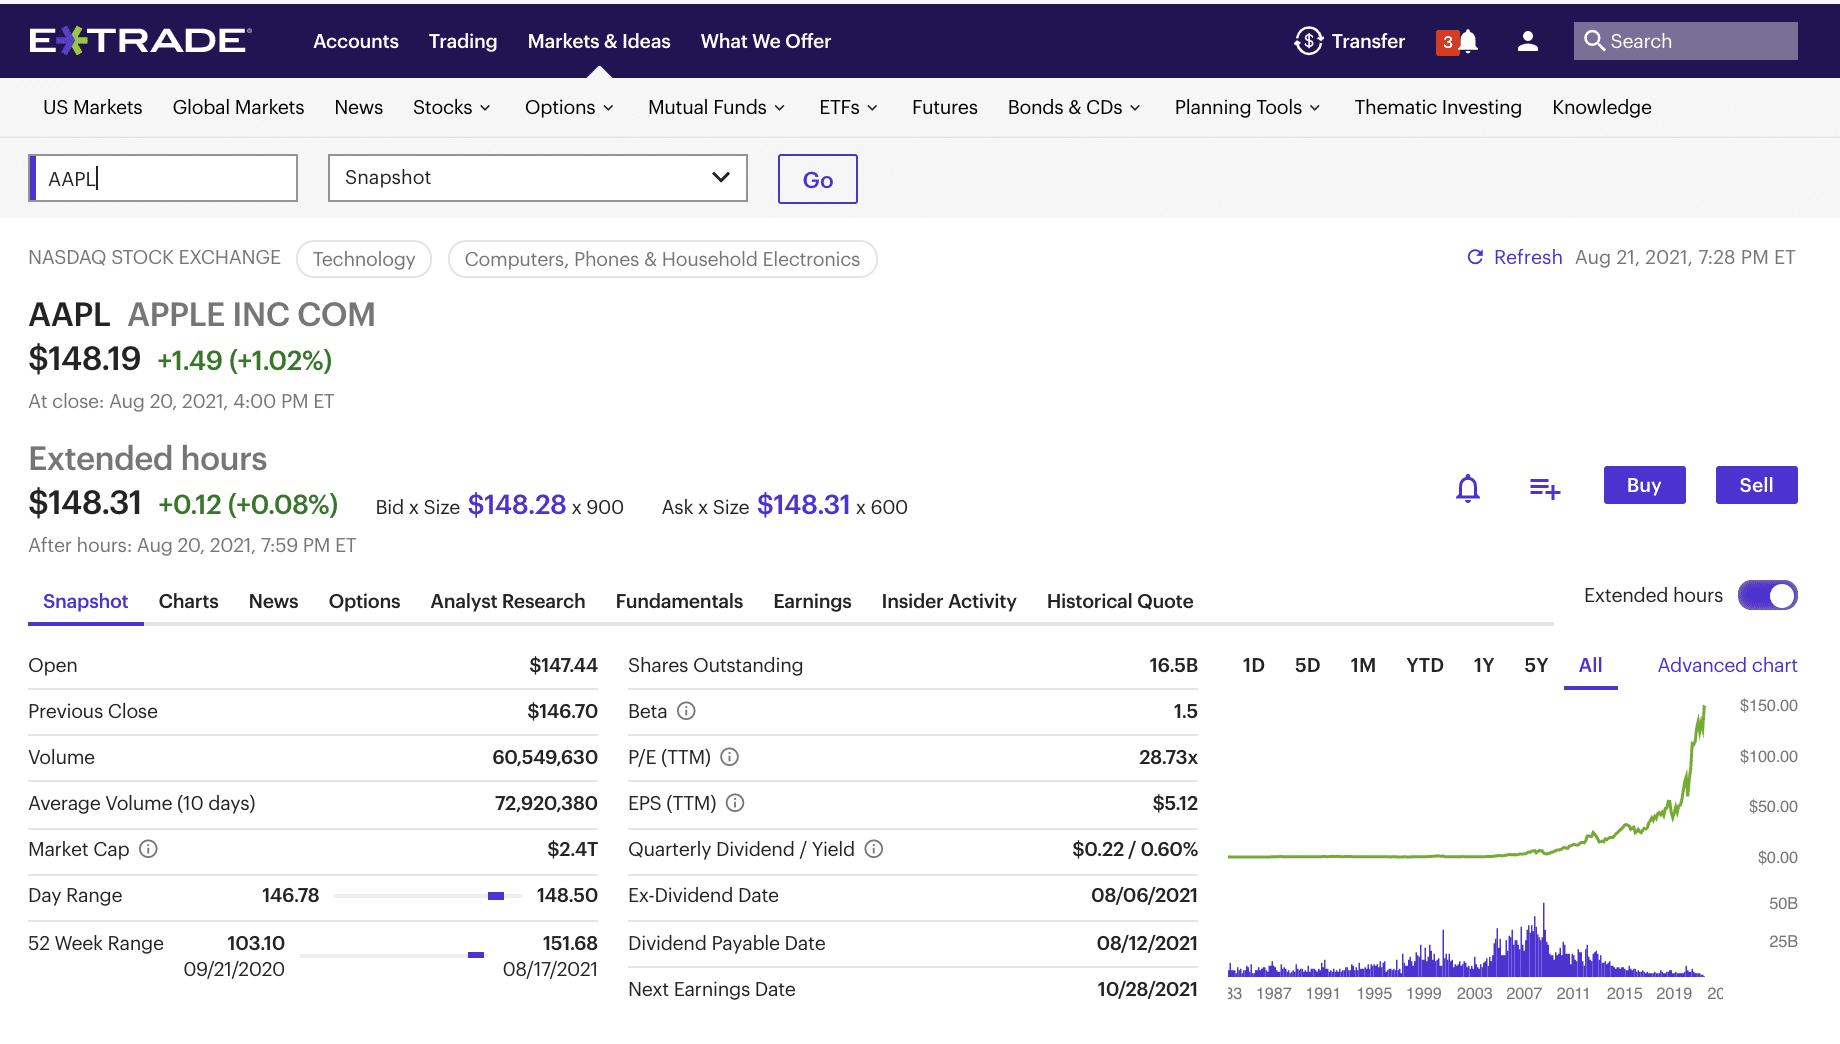 E*TRADE brokerage dashboard